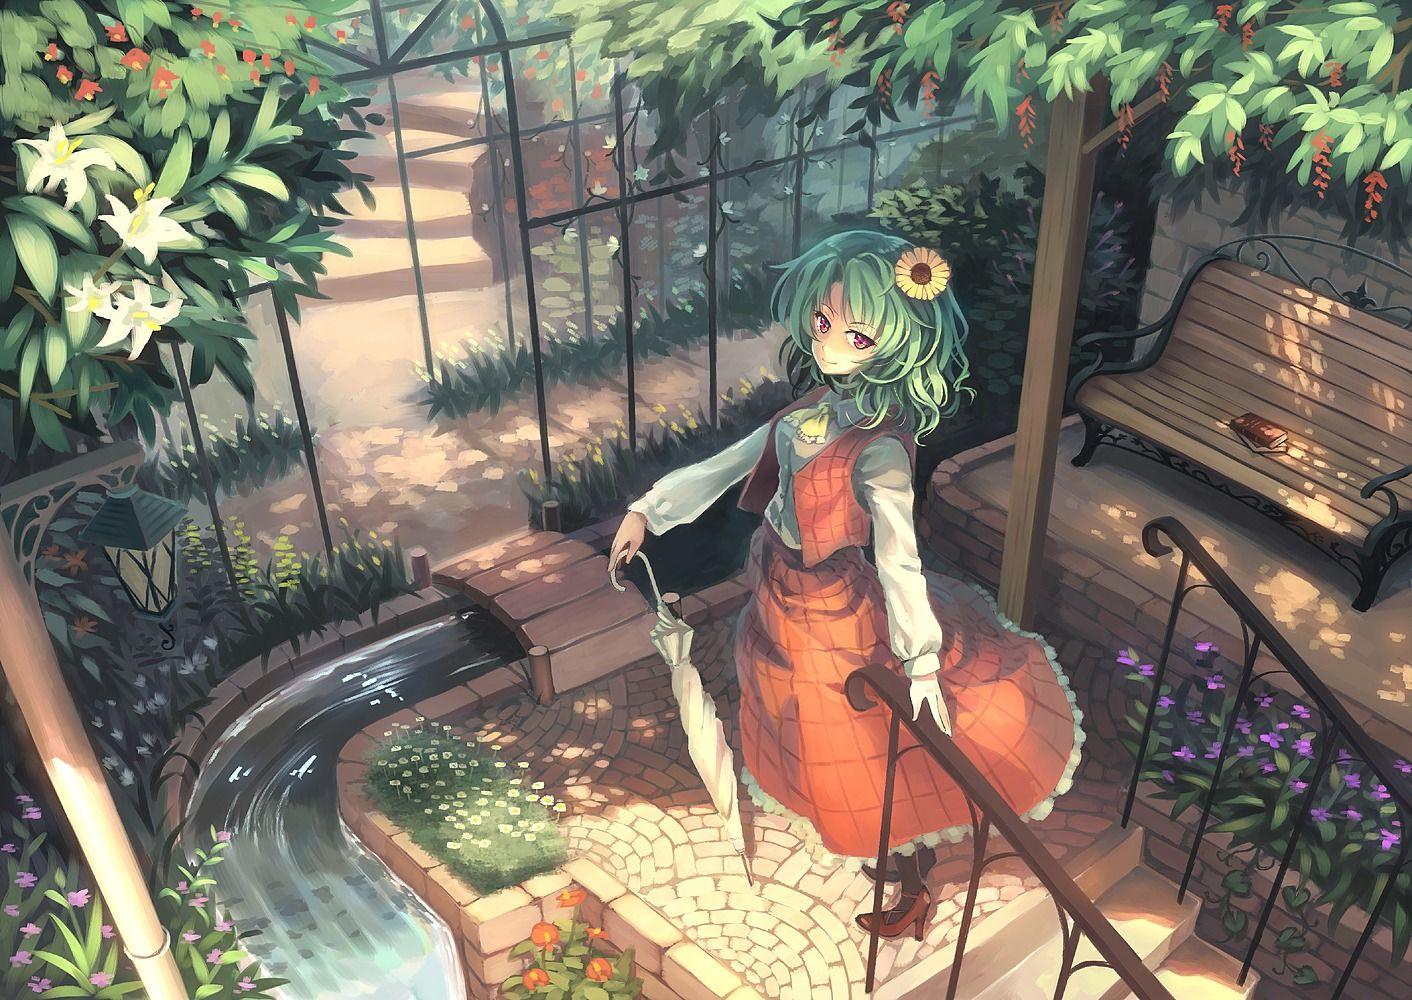 dress kazami yuuka orita enpitsu touhou yande re anime anime art anime fantasy